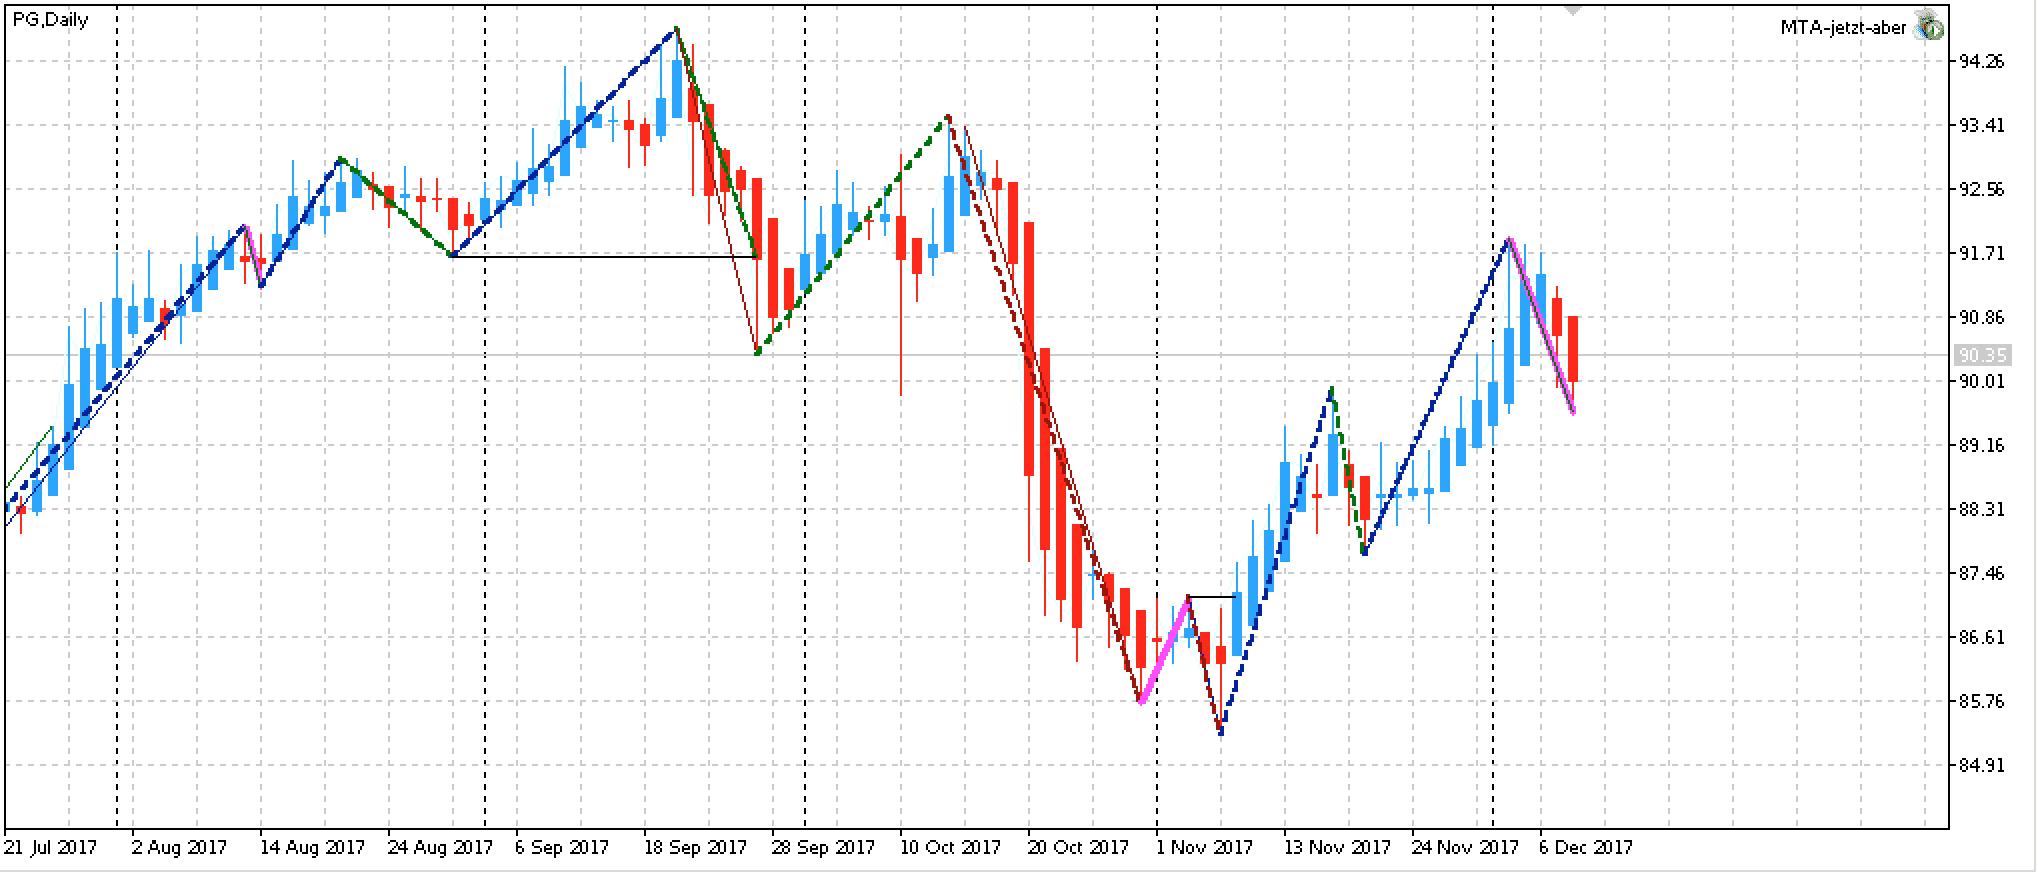 Analyse Chart Procter & Gamble als Edge-Aktie